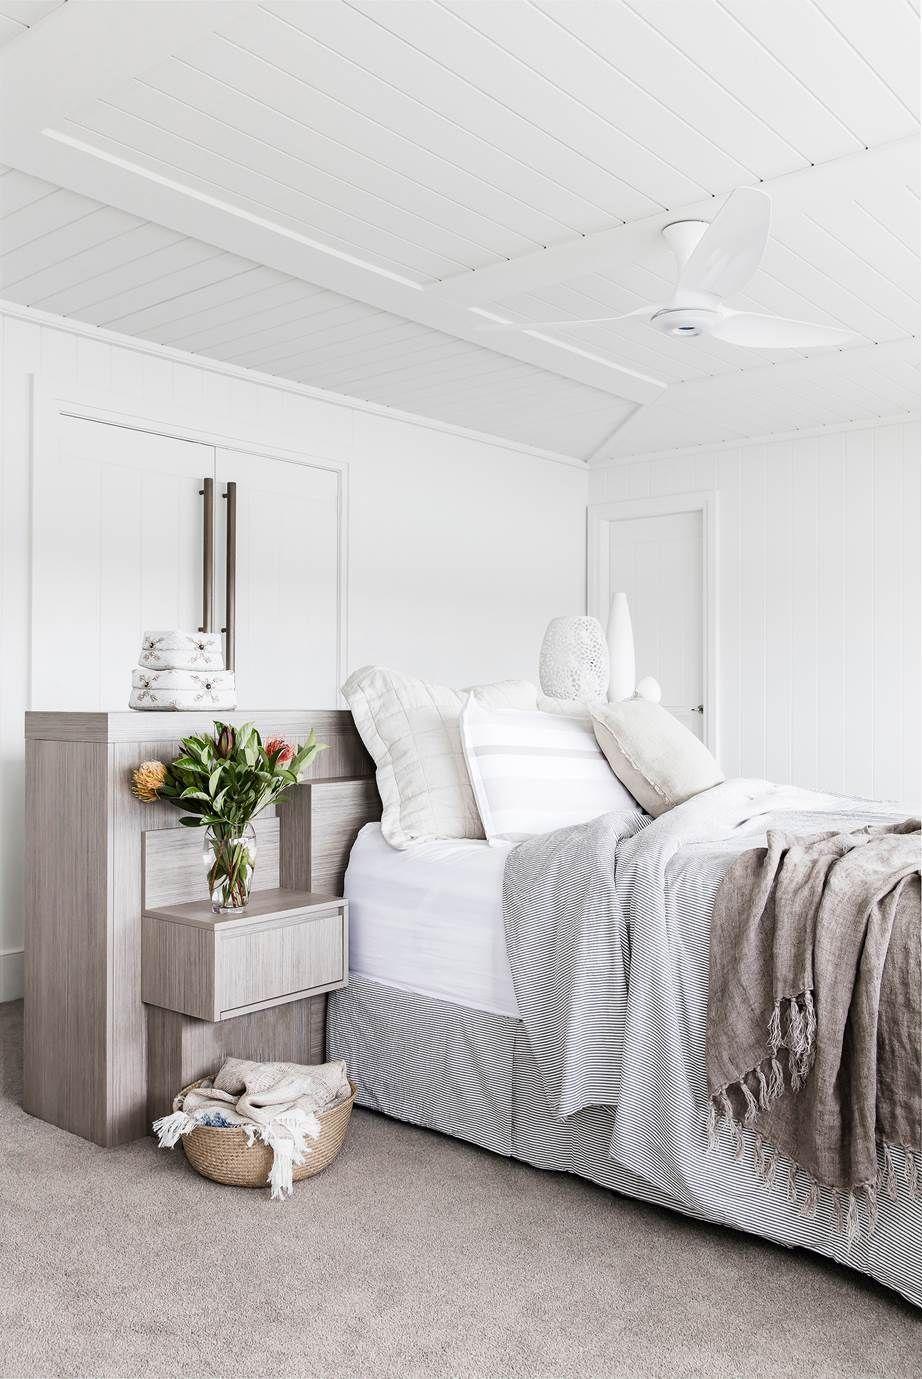 Master bedroom bedroom decor ideas   White Master Bedroom Décor Ideas  Master Bedroom Decor Ideas